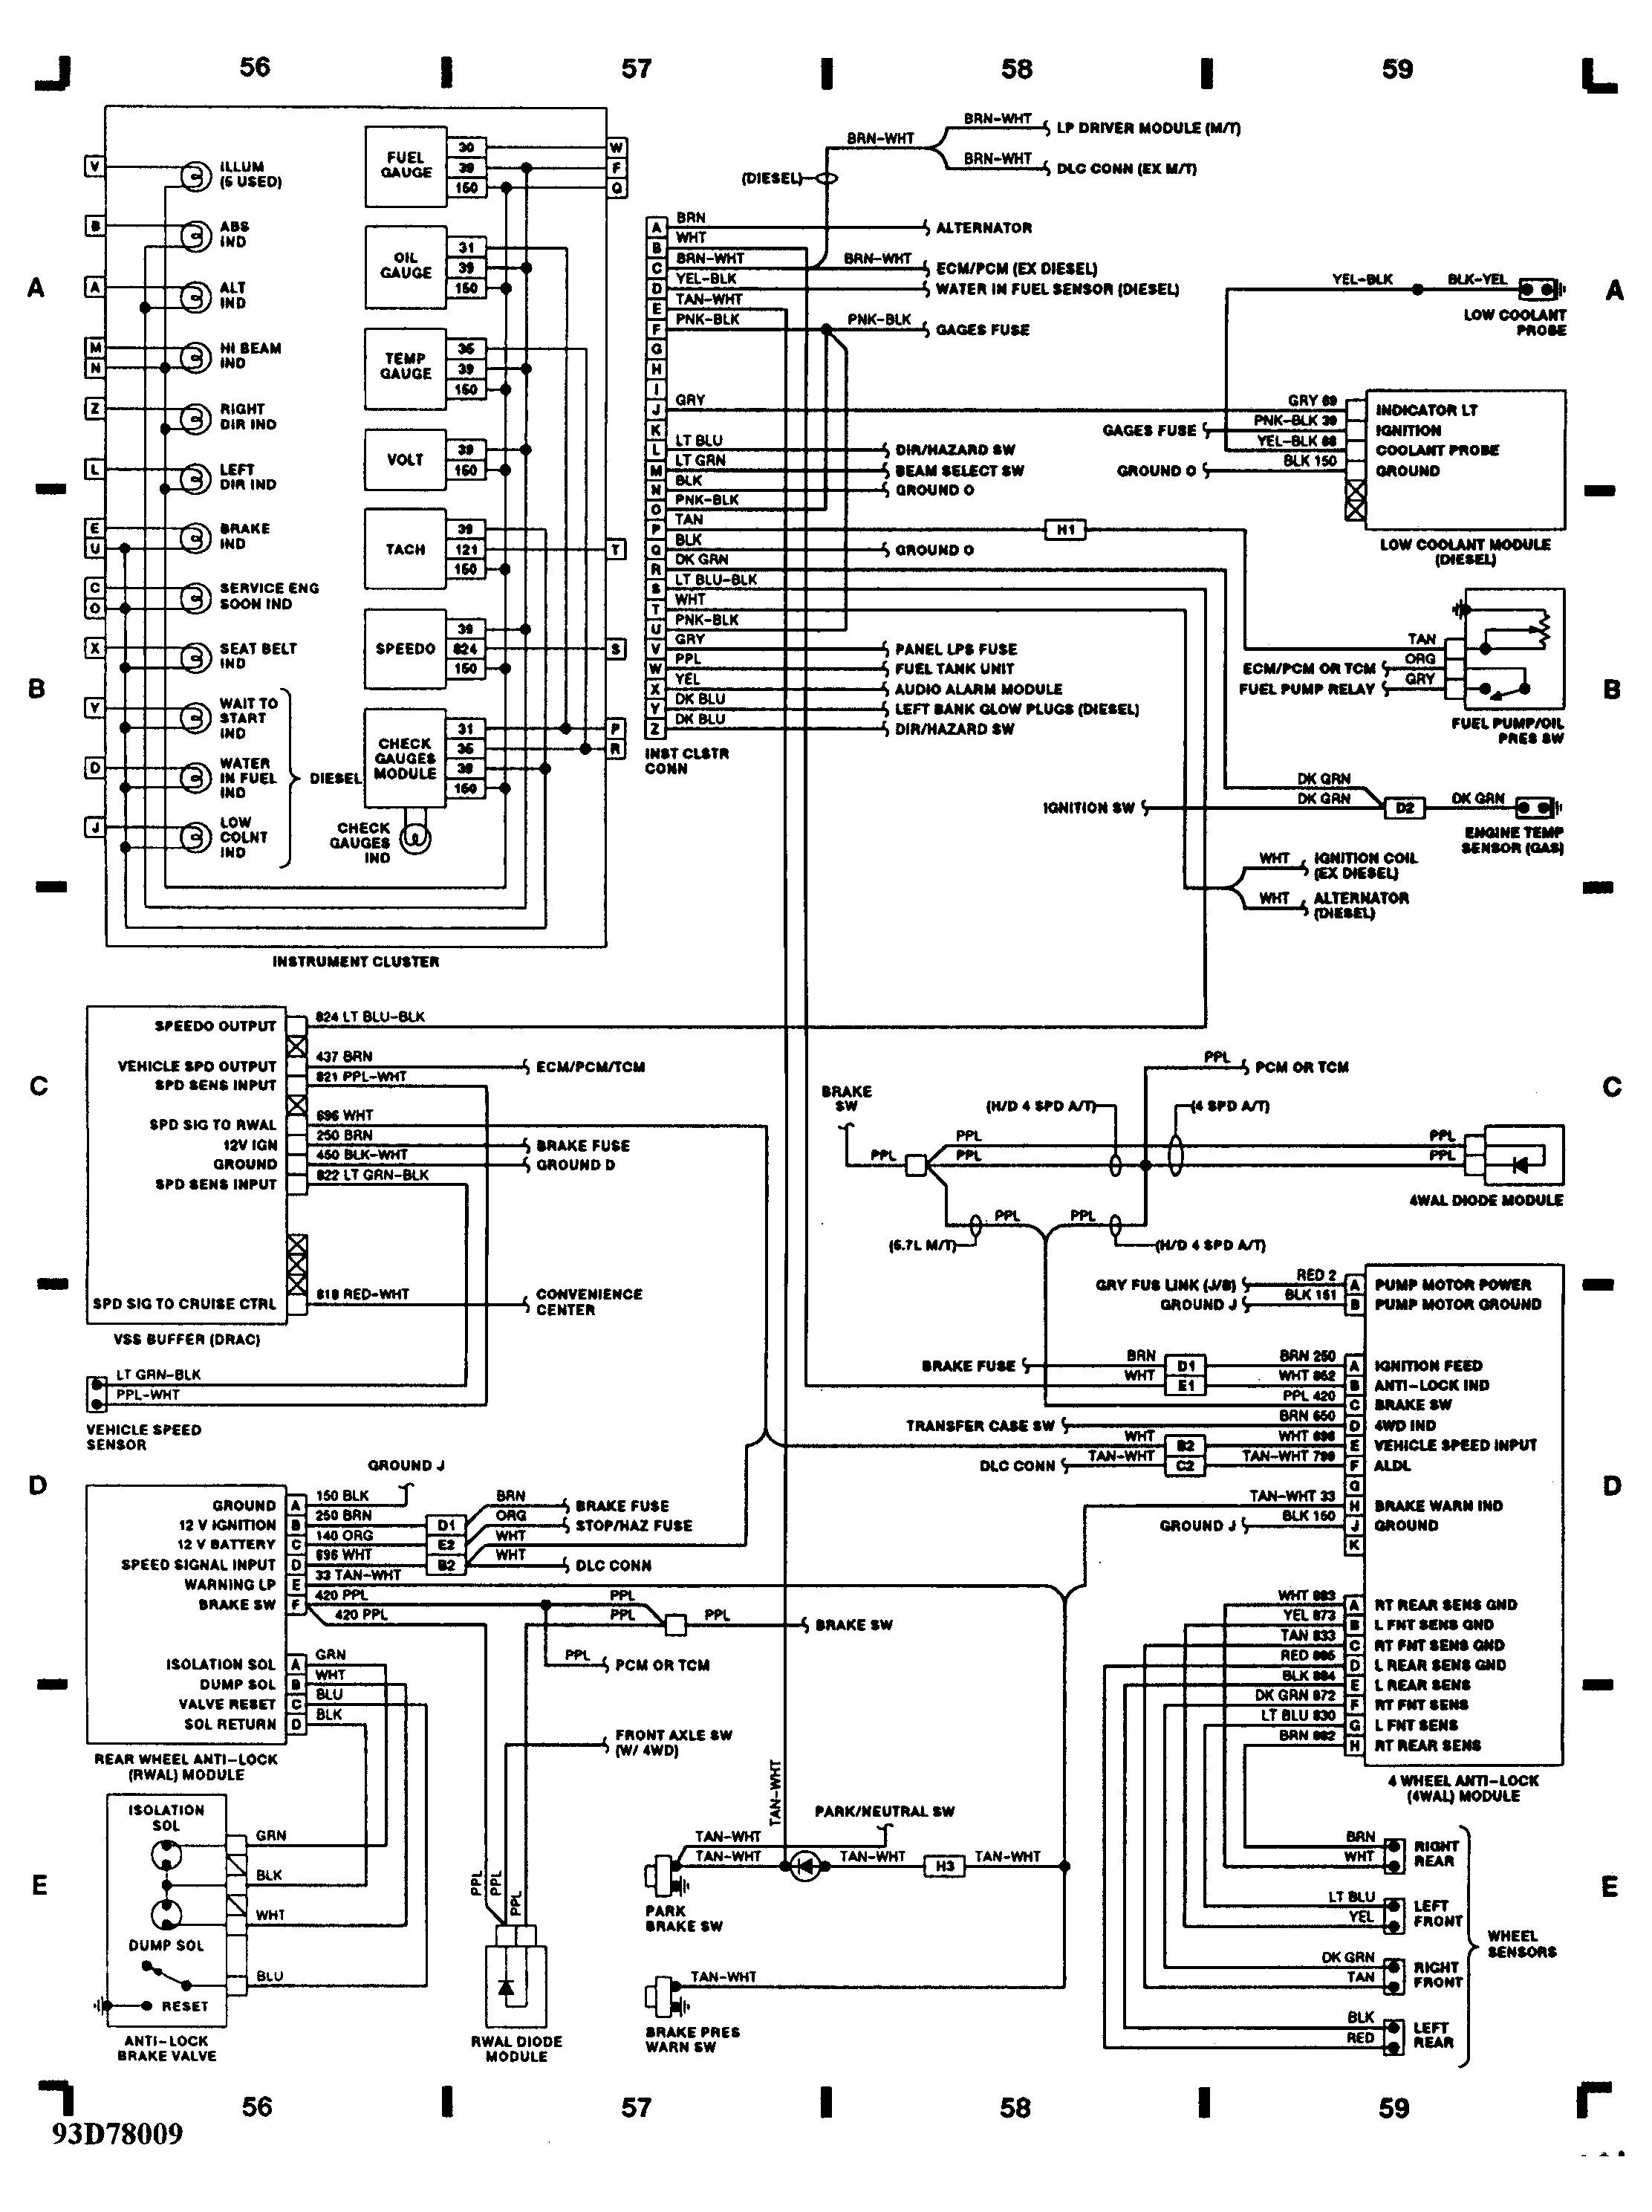 1979 chevy truck wiring diagram Collection-5 7 vortec wiring harness diagram wiring diagram rh visithoustontexas org 1993 chevy silverado 1500 wiring harness 1993 chevy silverado 1500 wiring 4-j